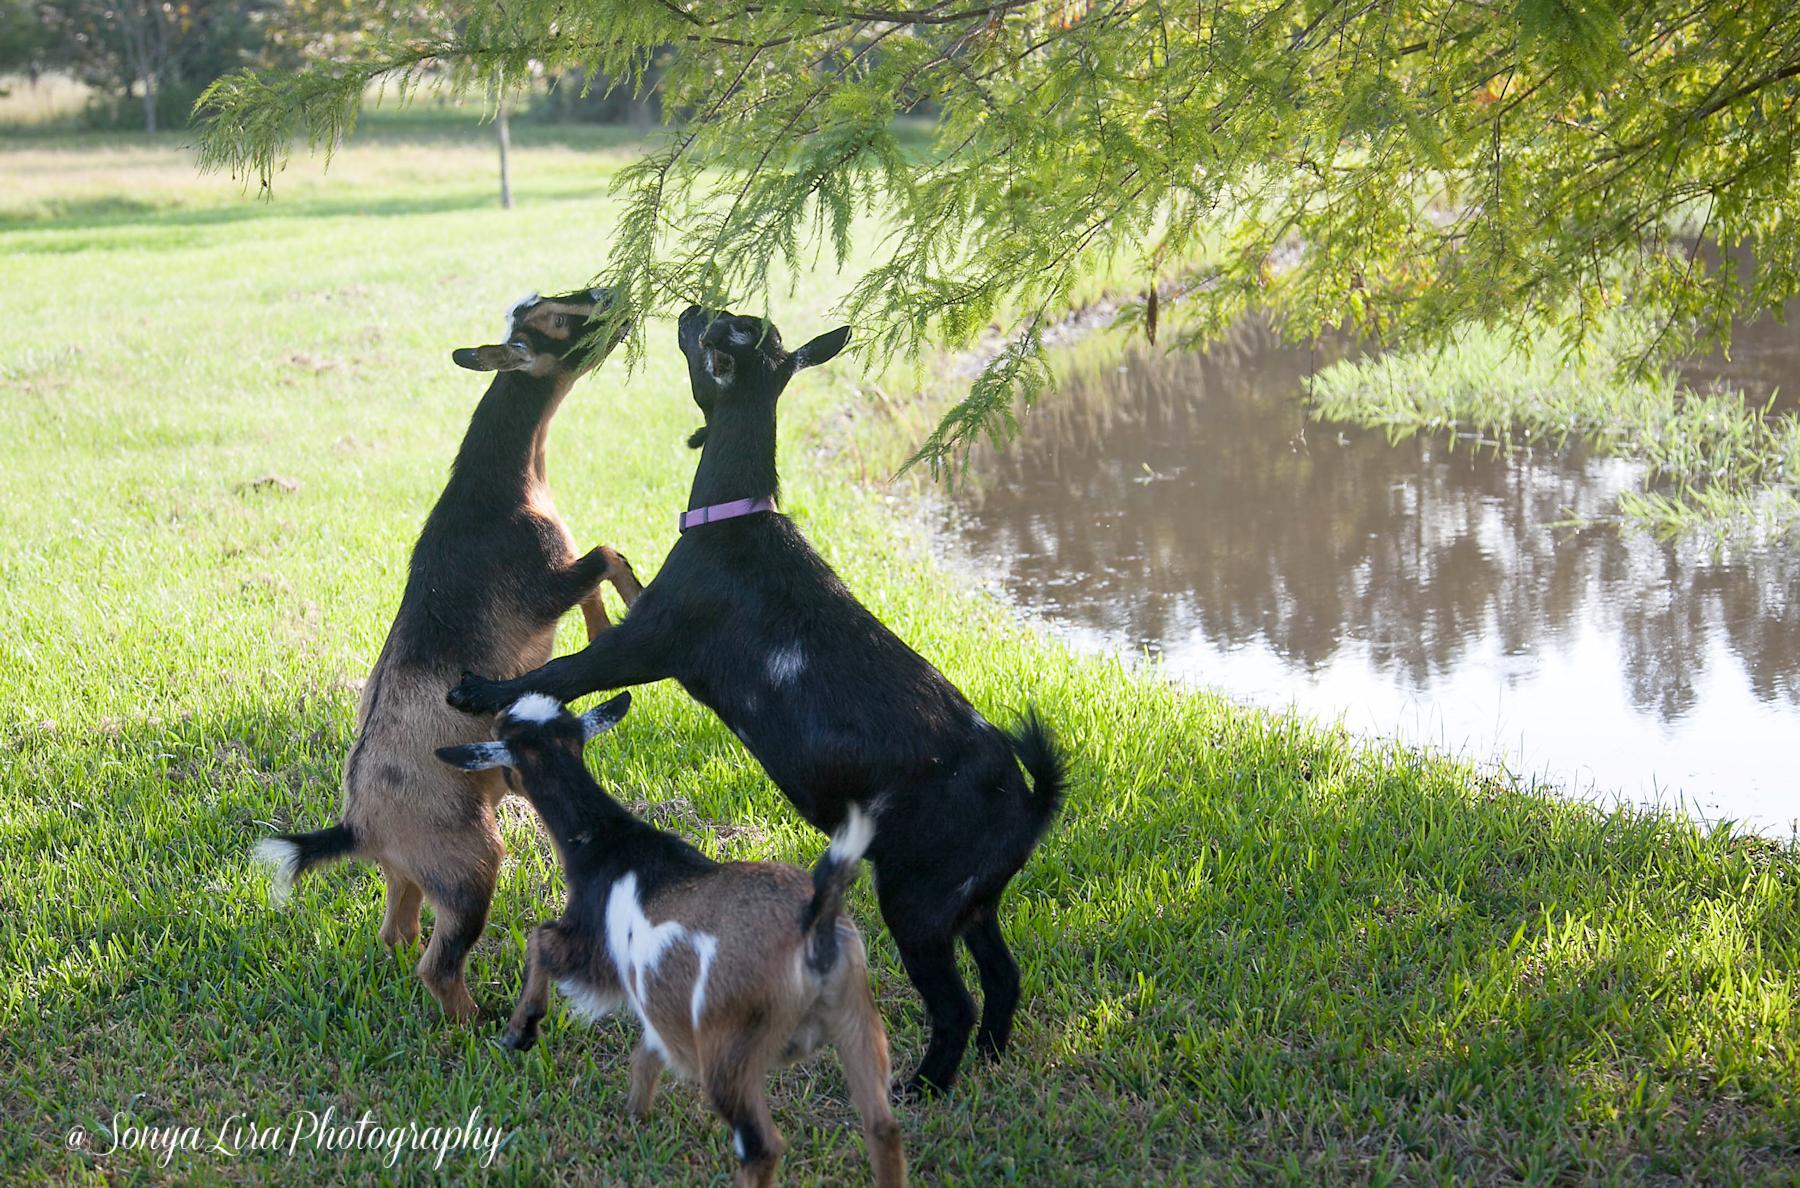 Goats1